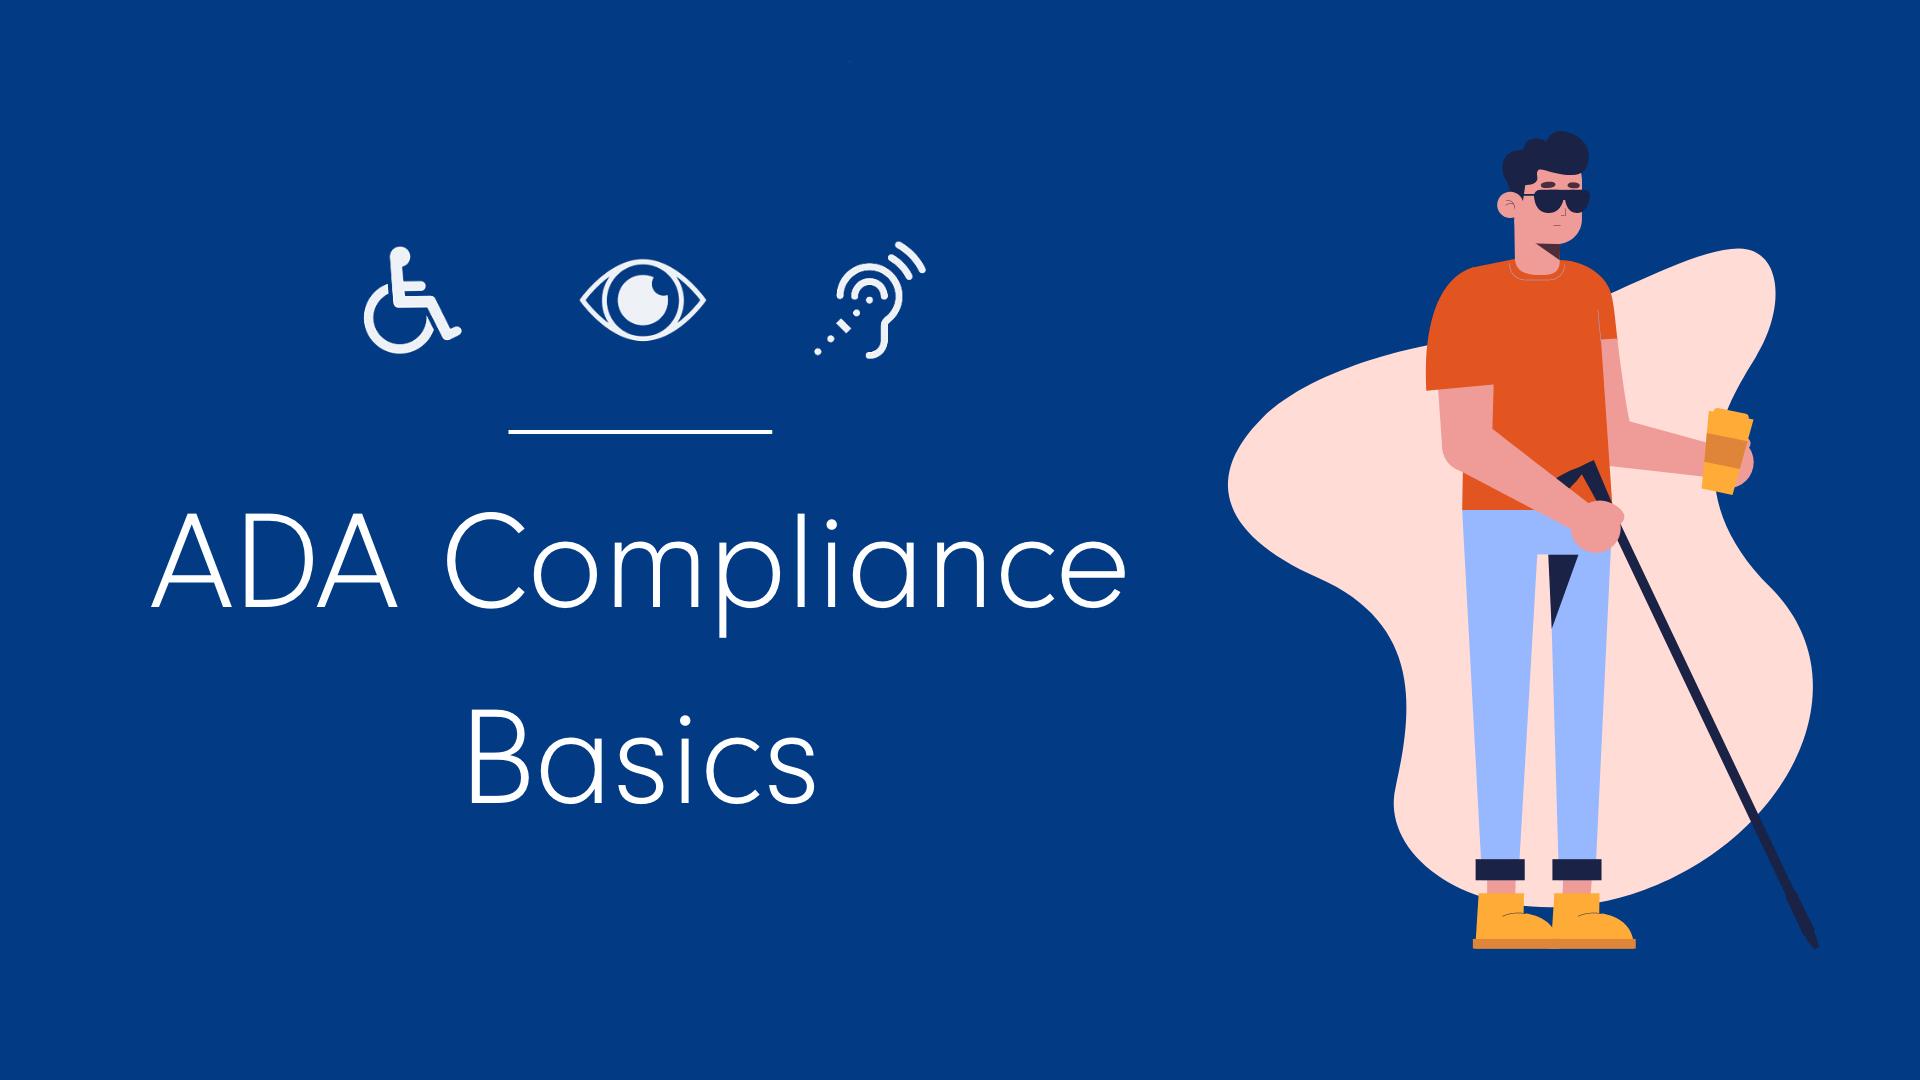 ADA Compliance Basics - Aria Labels, Color Contrast, Hover & Focus, Duplicate Link Text